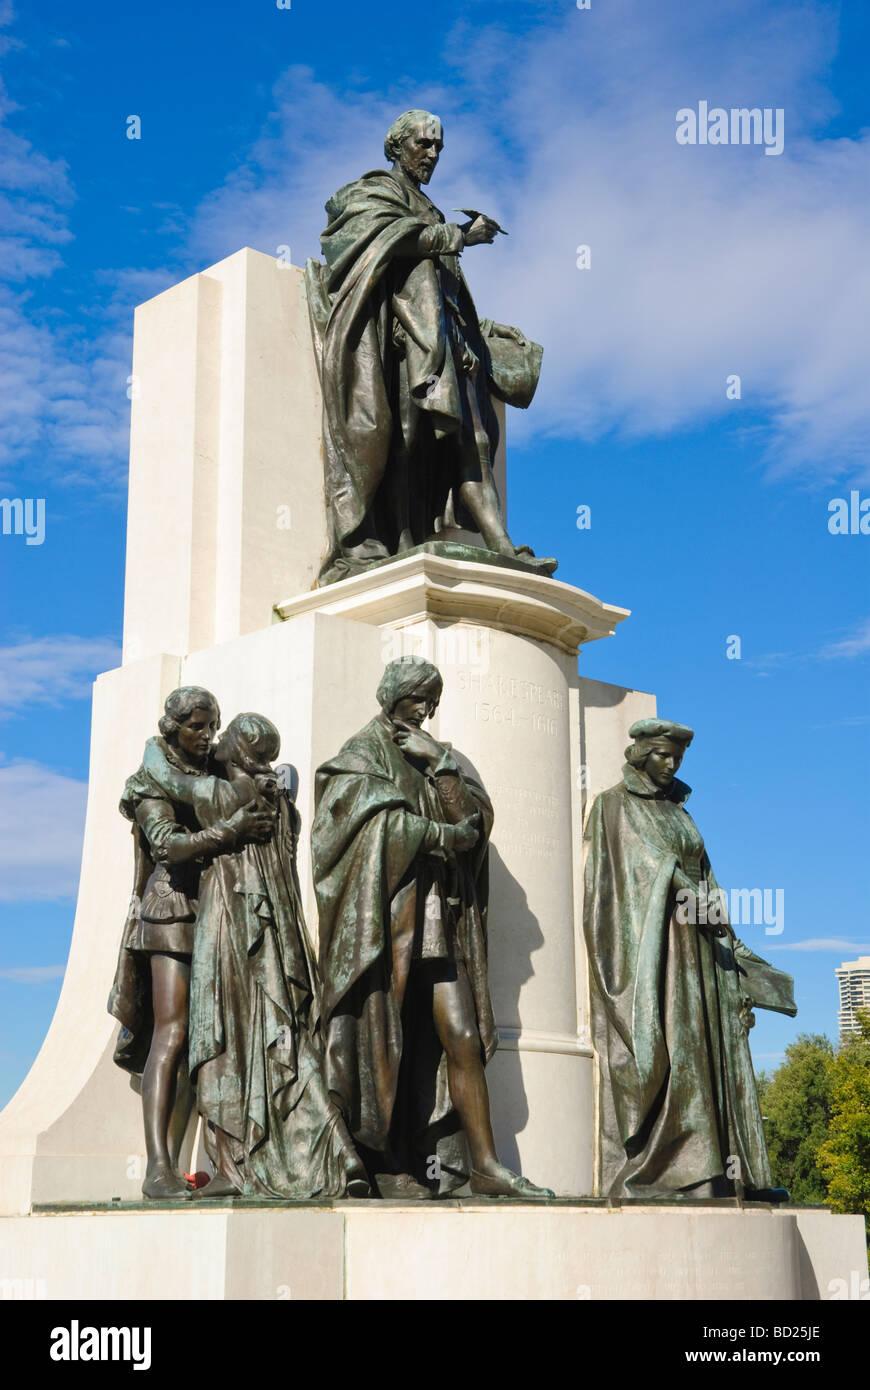 Bronze statues in memorial to Shakespeare. Sydney, Australia. - Stock Image